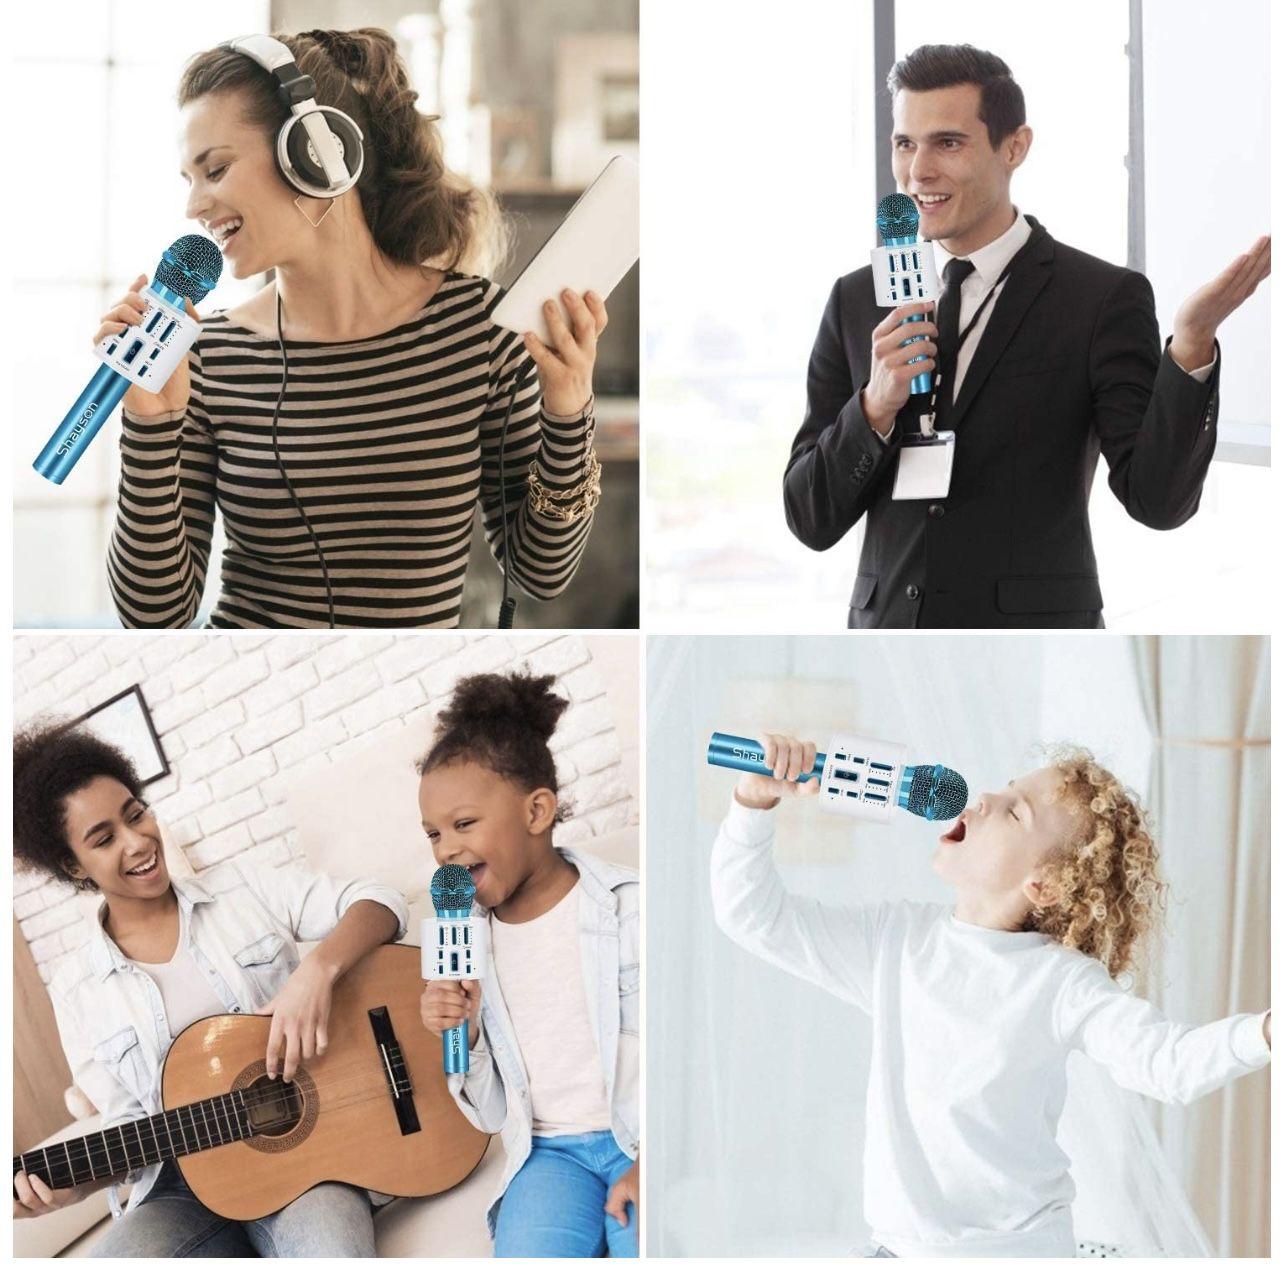 Wireless Karaoke Microphone, Bluetooth Microphone with LED Lights, 3 in 1 Portable Handheld Speaker Machine for Kids & Adults, Karaoke Microphone for